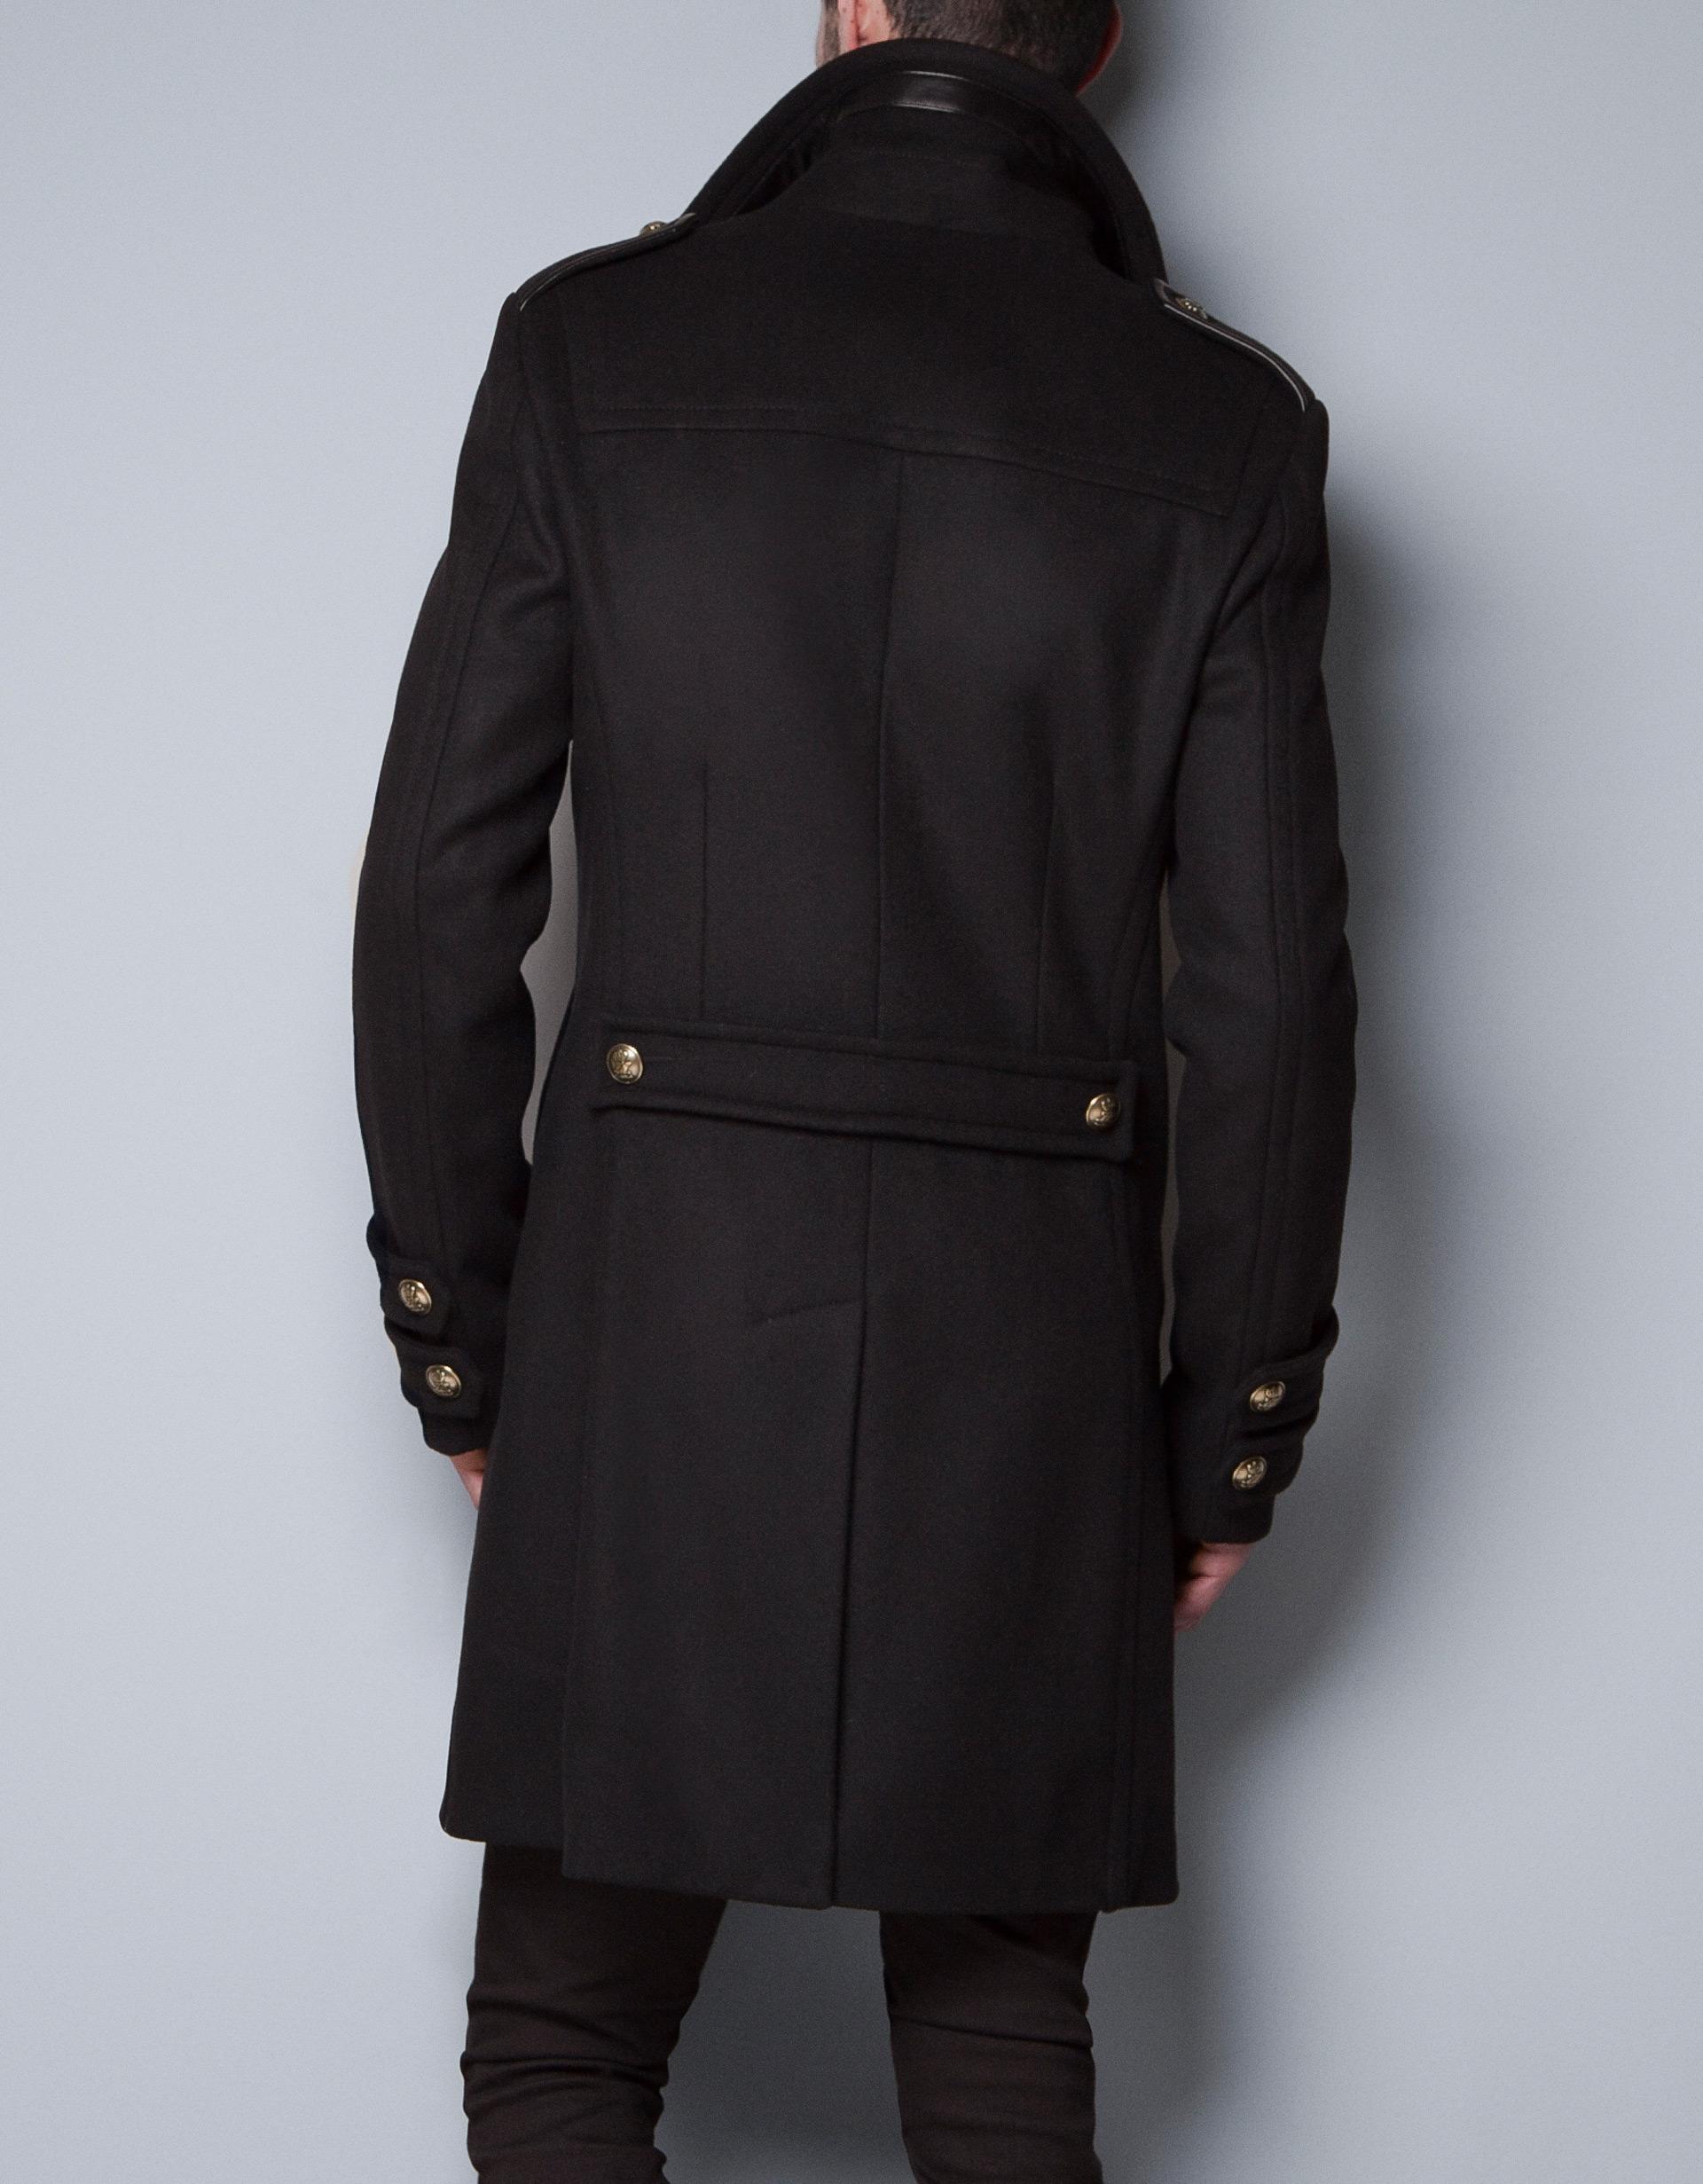 Black Military Style Coat